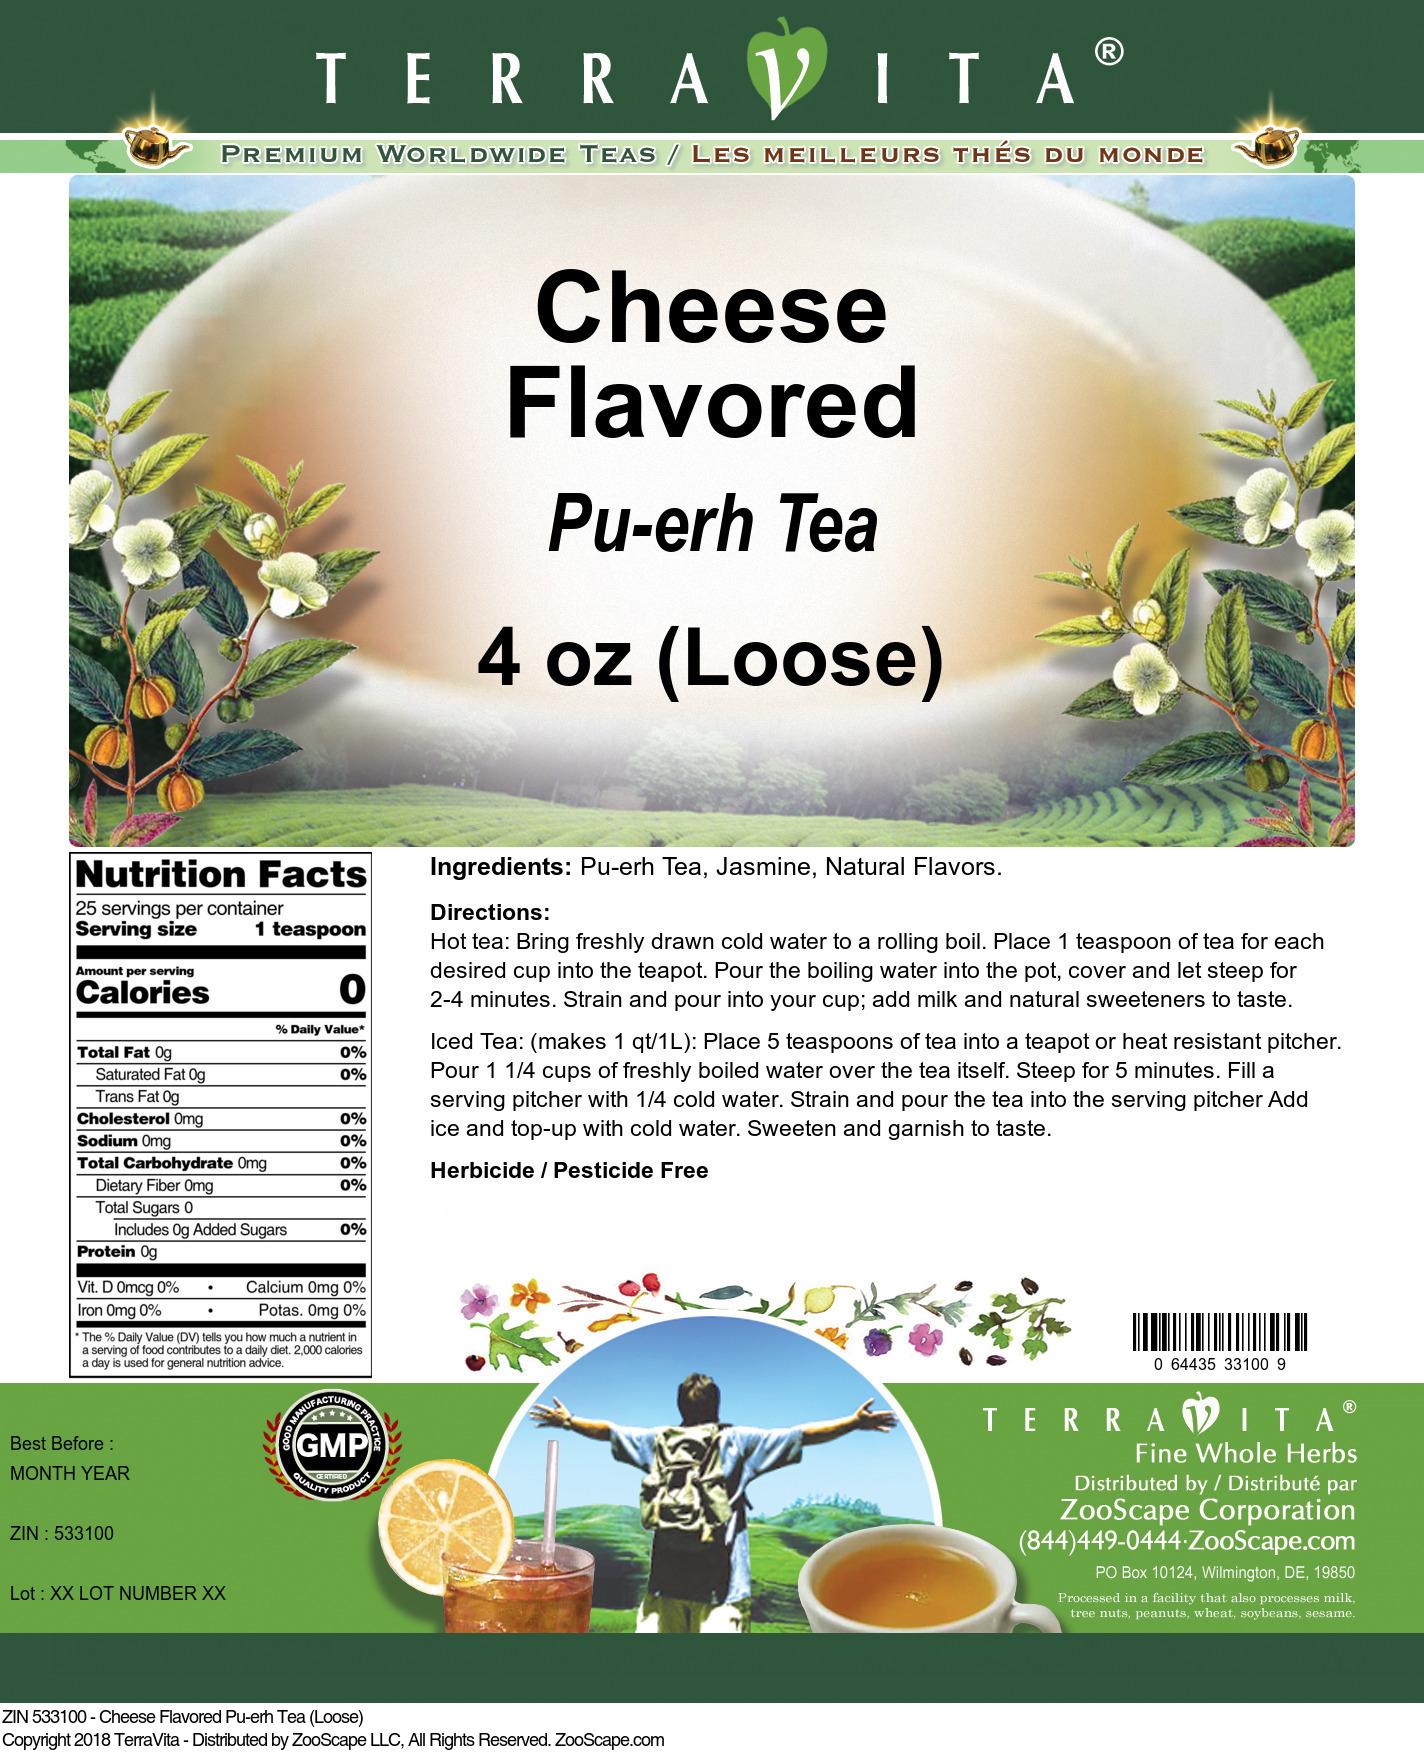 Cheese Flavored Pu-erh Tea